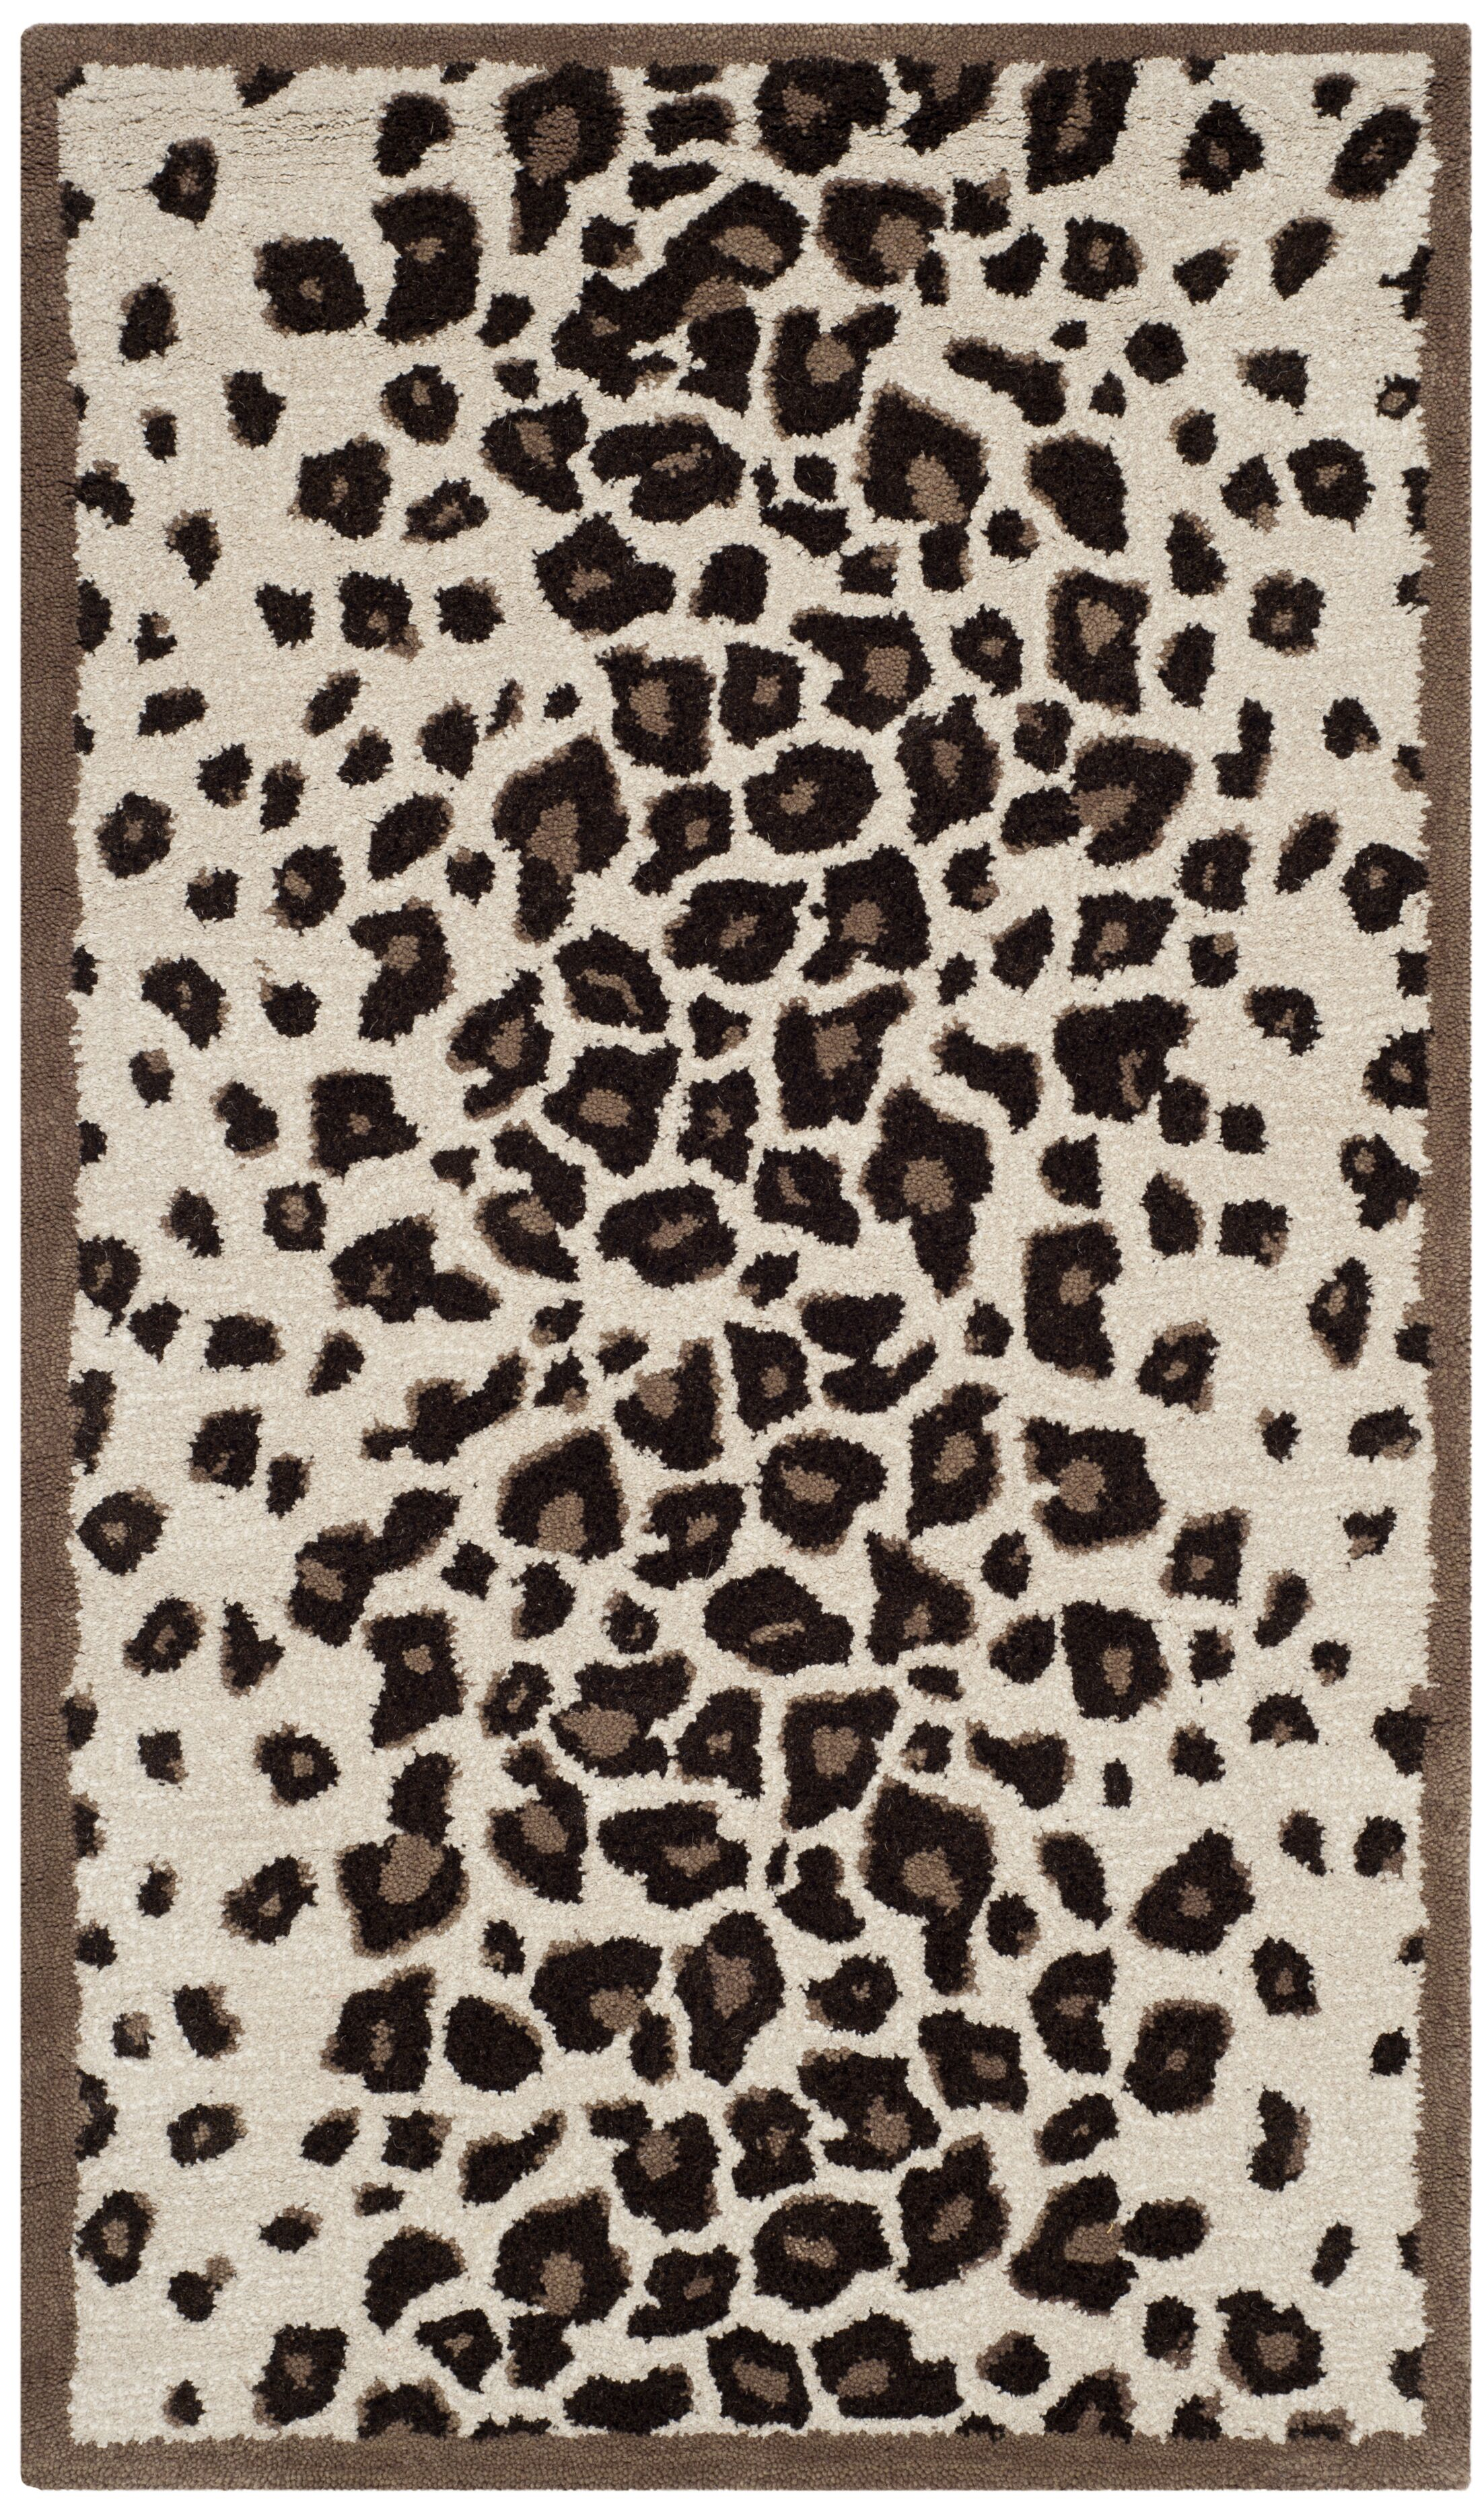 Martha Stewart Sequoia Brown Area Rug Rug Size: Rectangle 9' x 12'